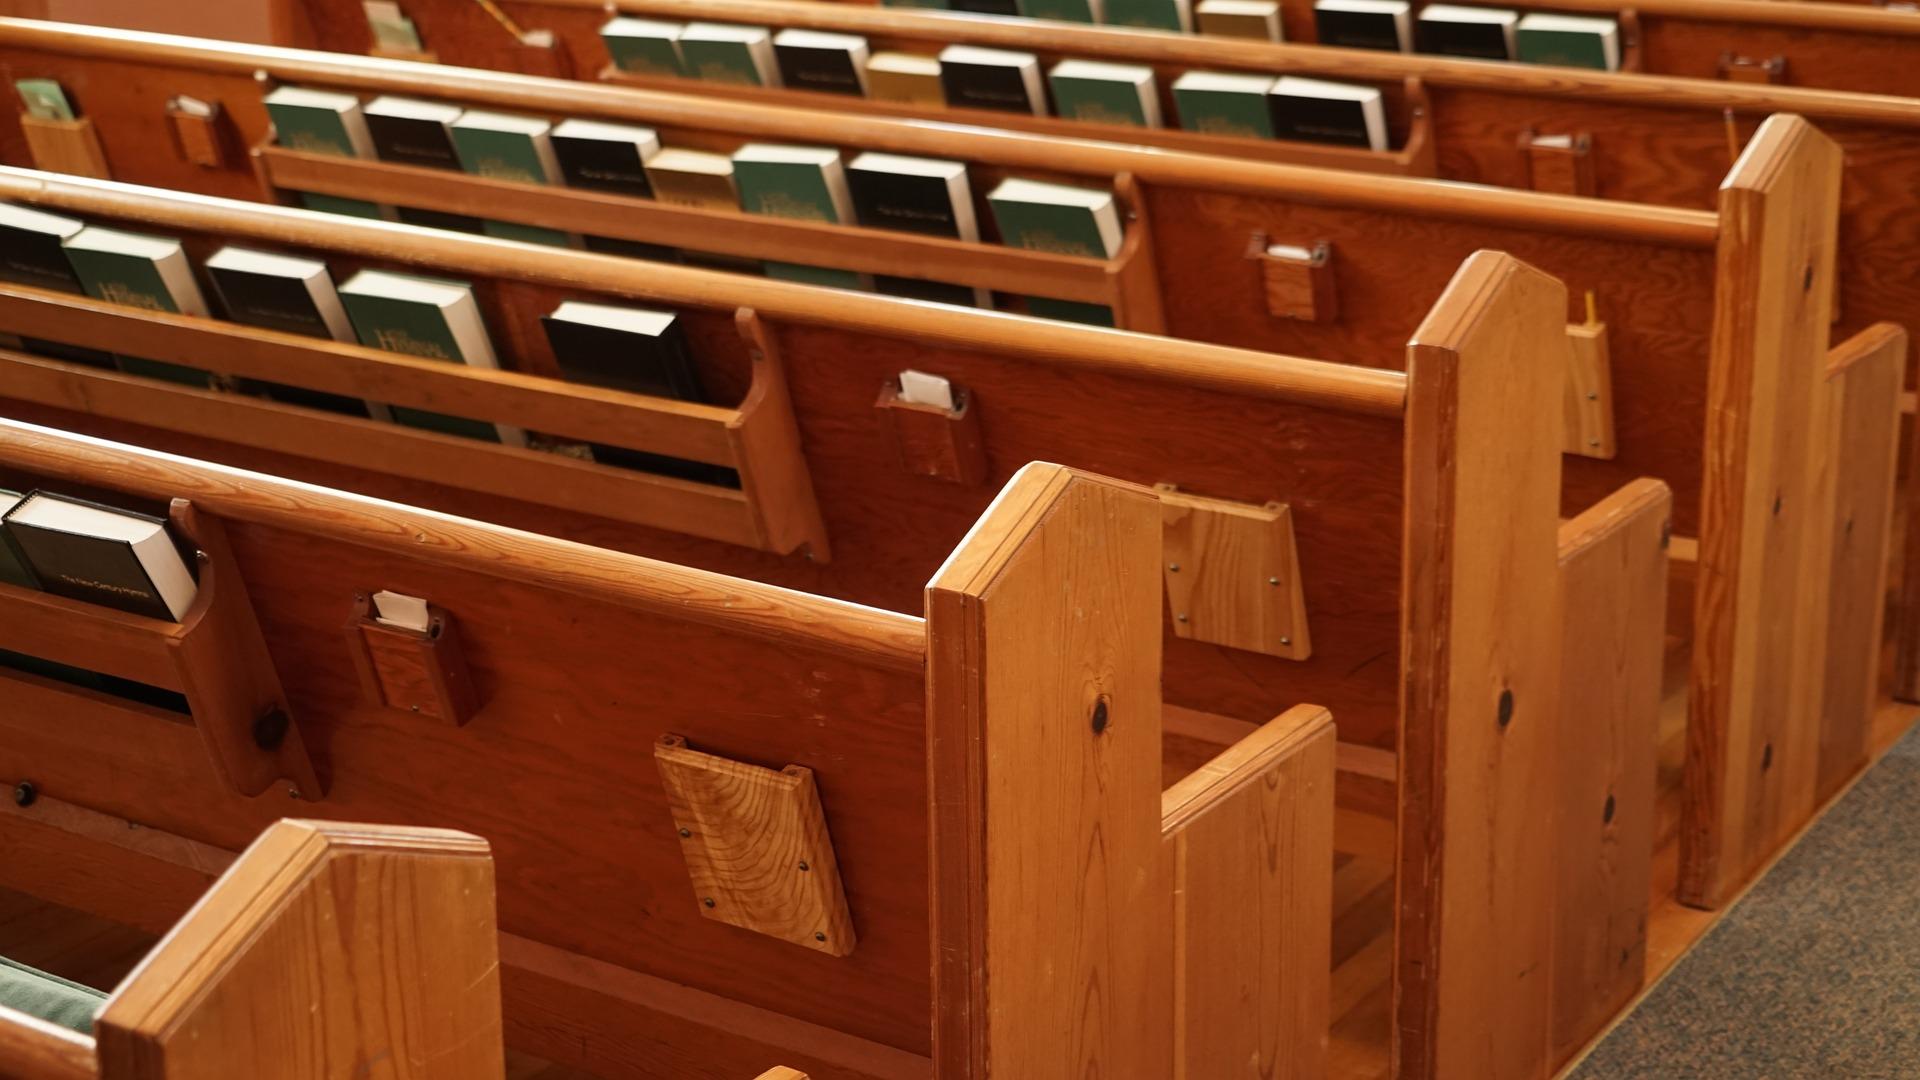 church pew generic_548201